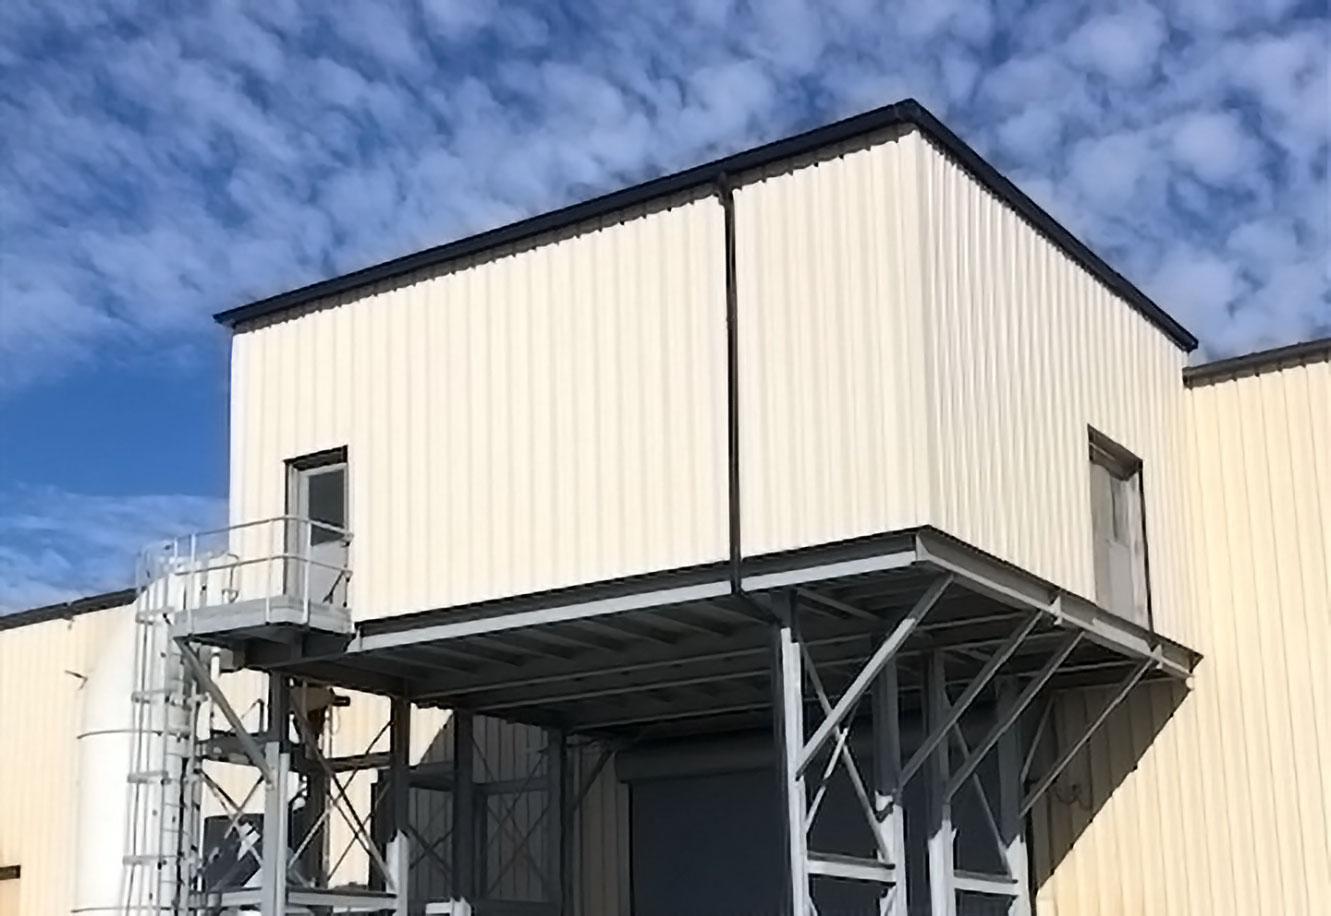 Court Galvanizing - Raised Enclosure Project Picture